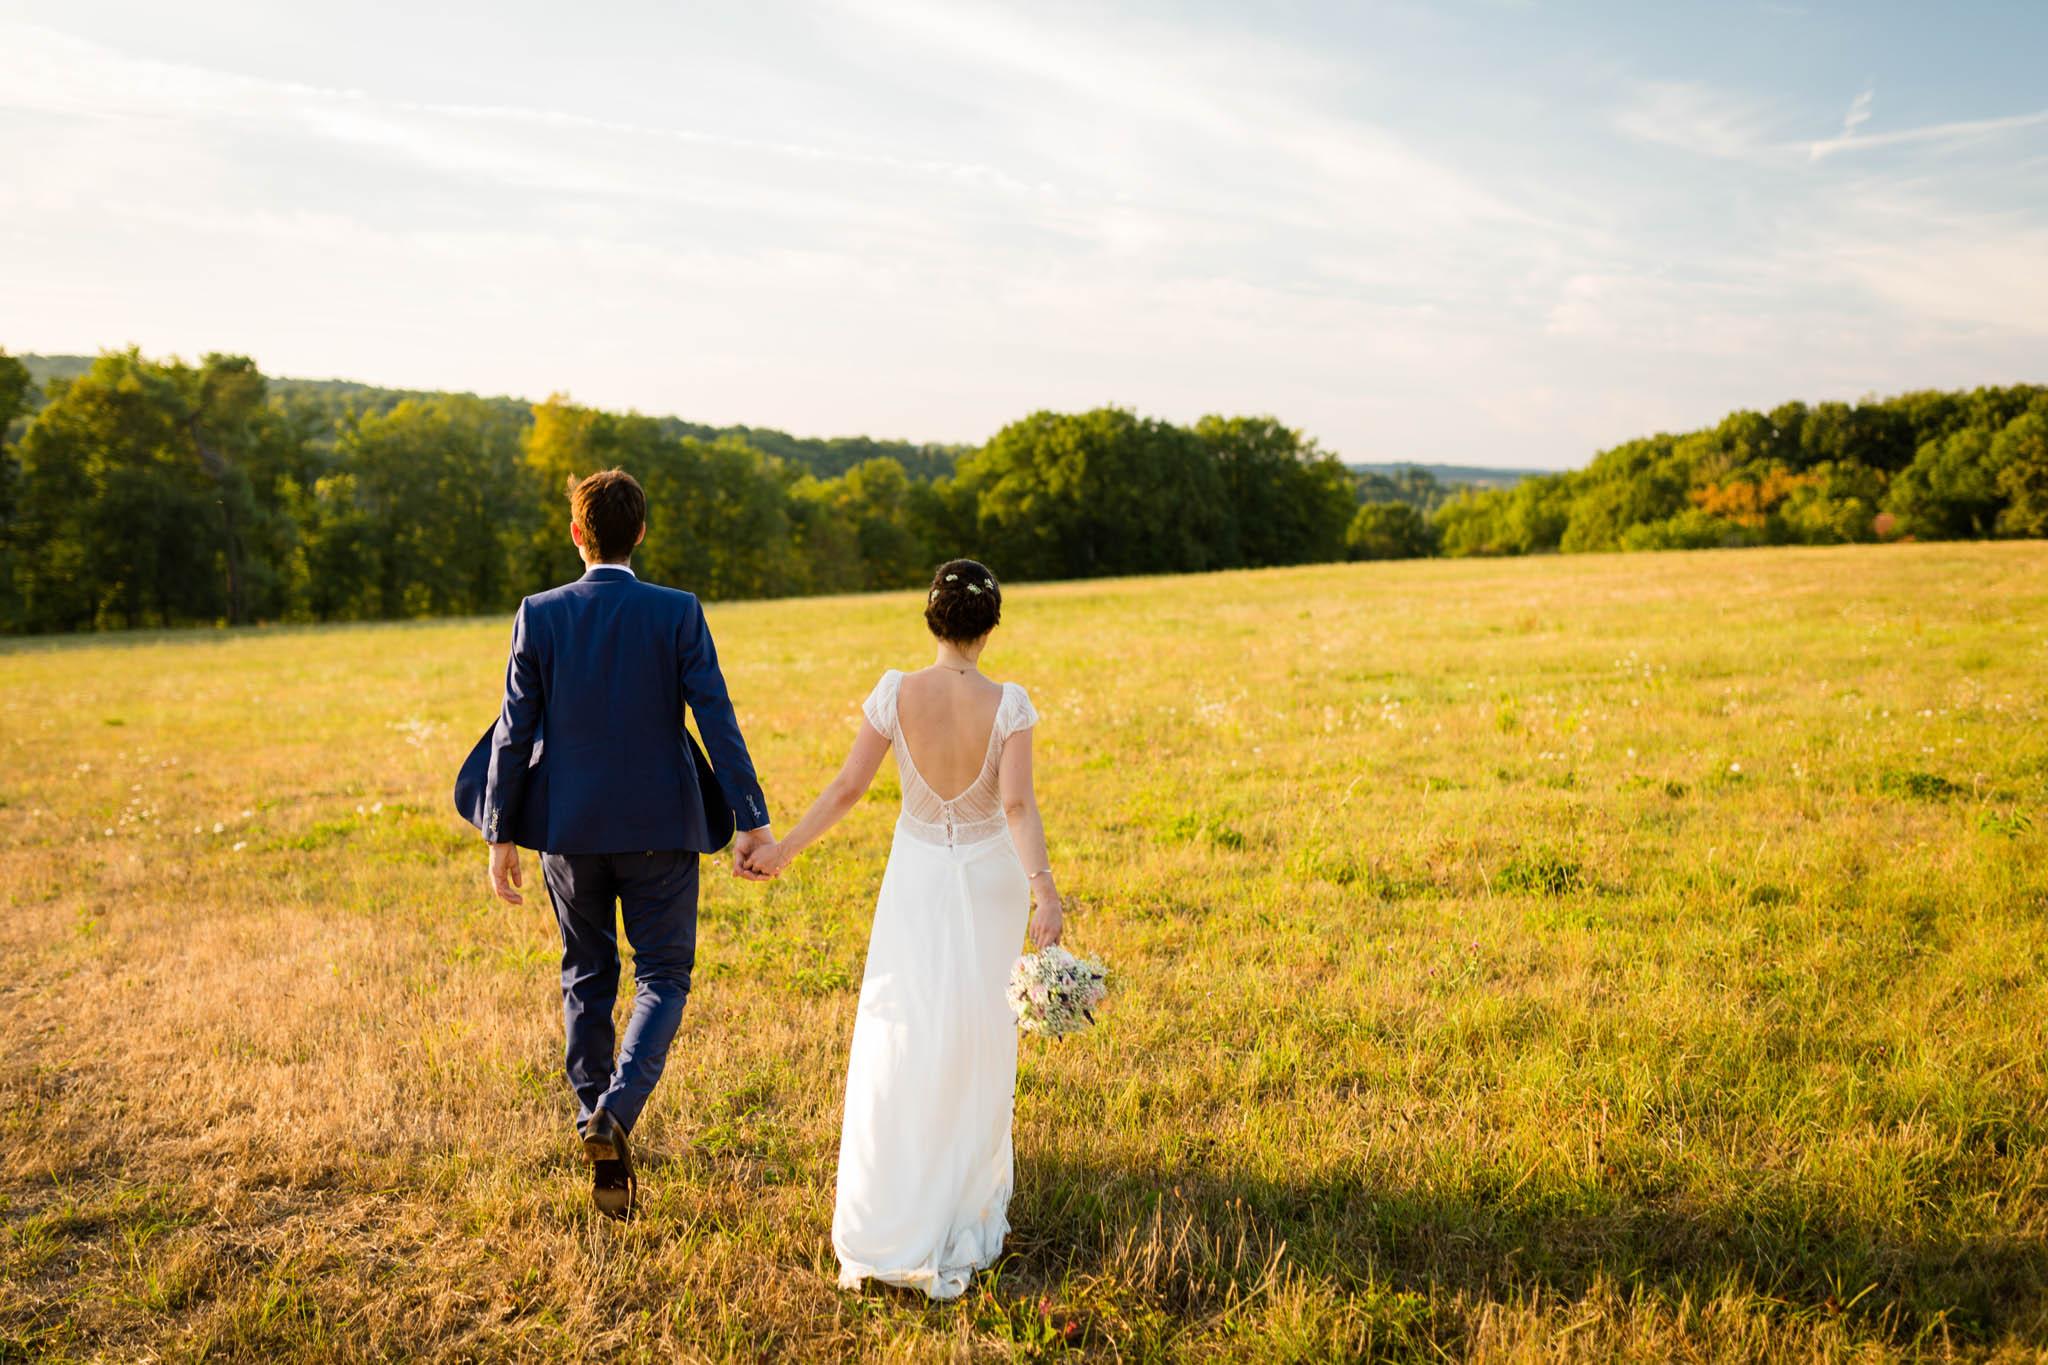 02_photographe-mariage-bordeaux-gironde-alexandre-roschewitz-photographies-portfolio